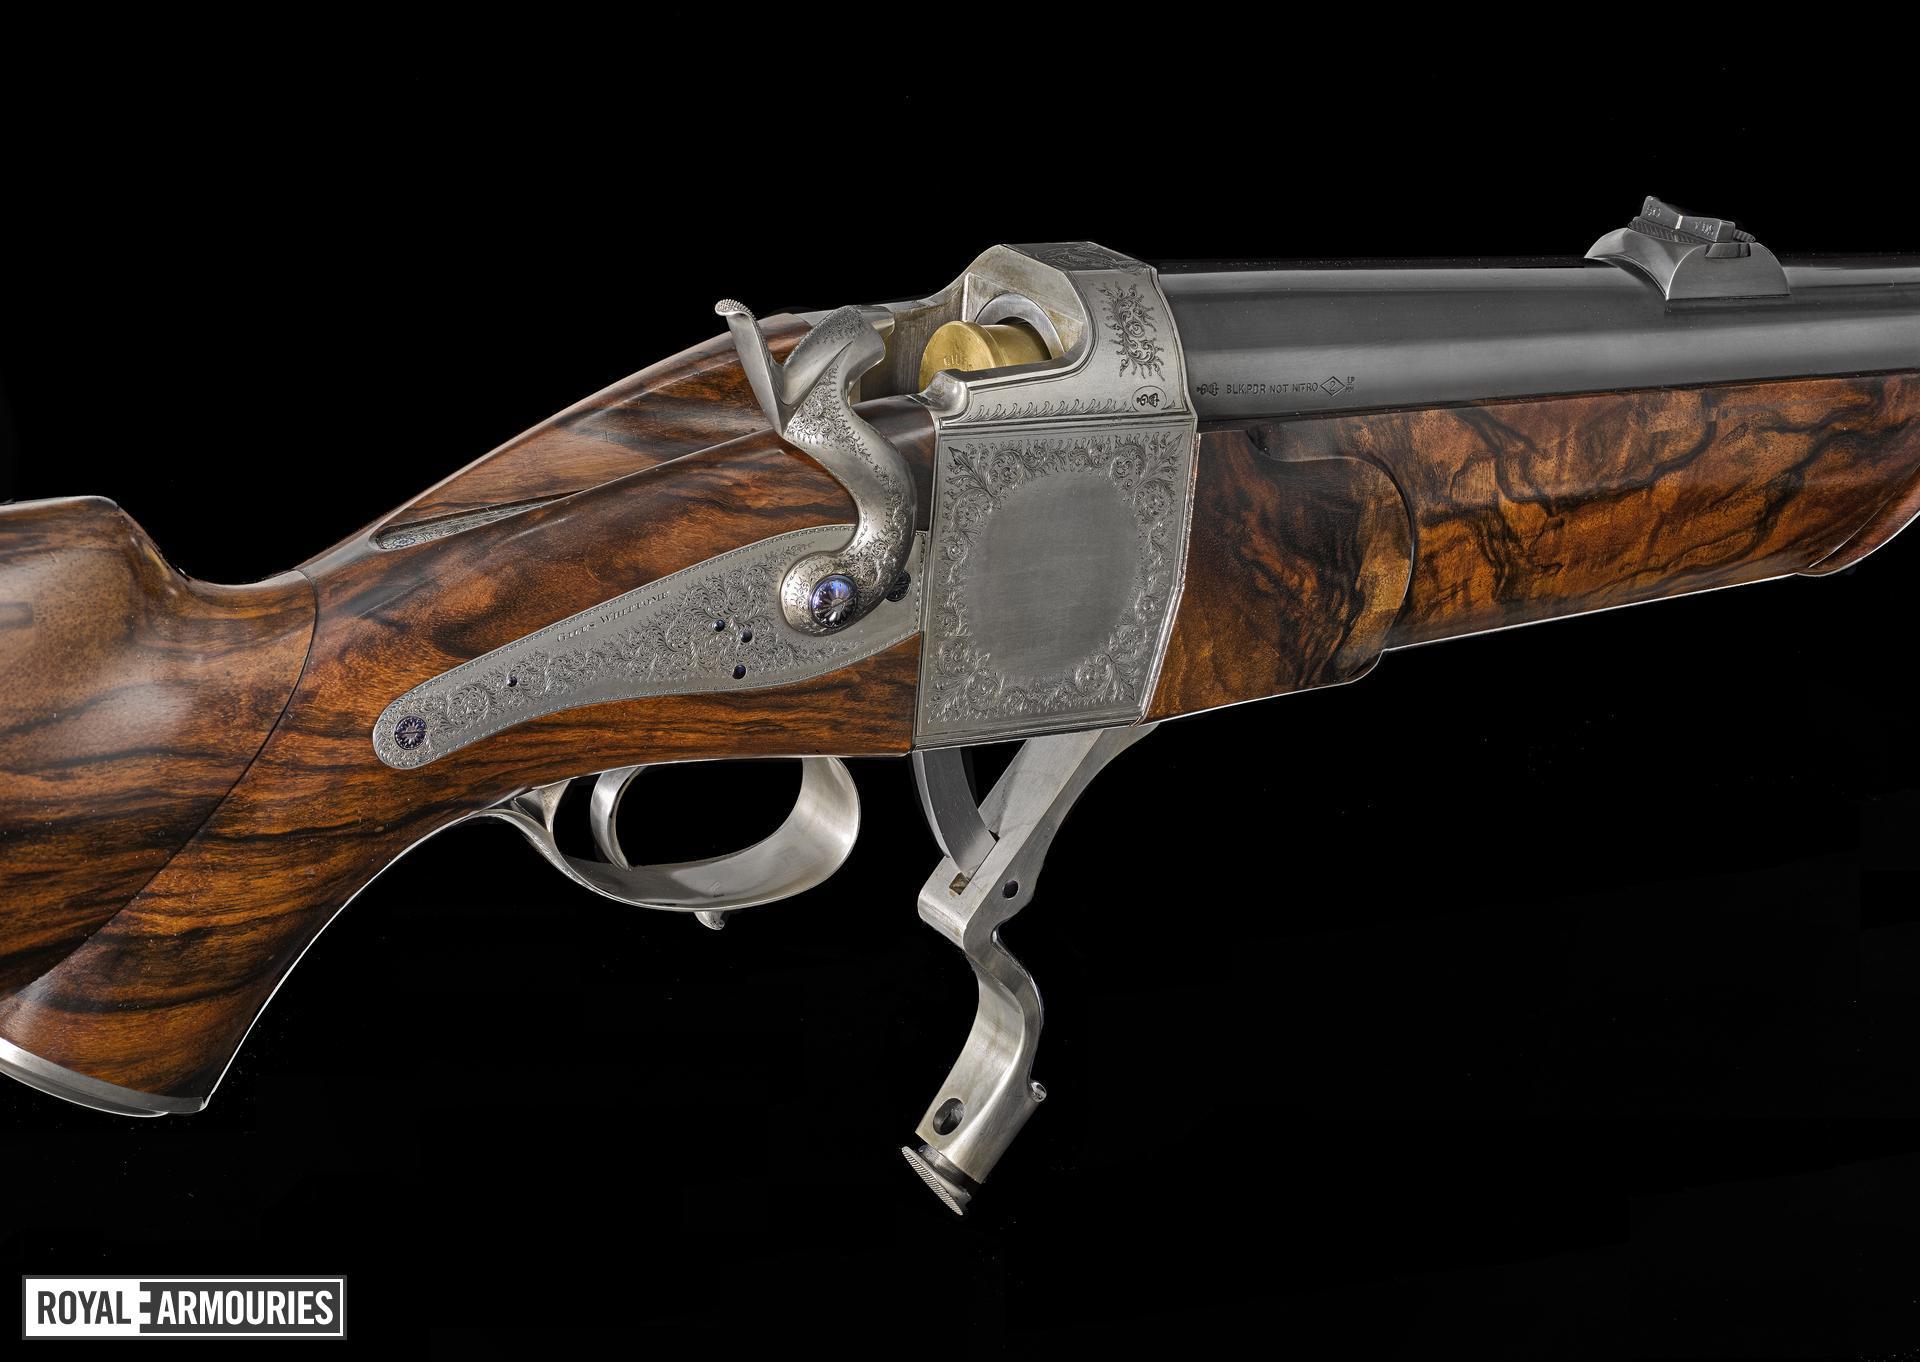 Centrefire breech-loading sporting rifle - The Millennium Gun